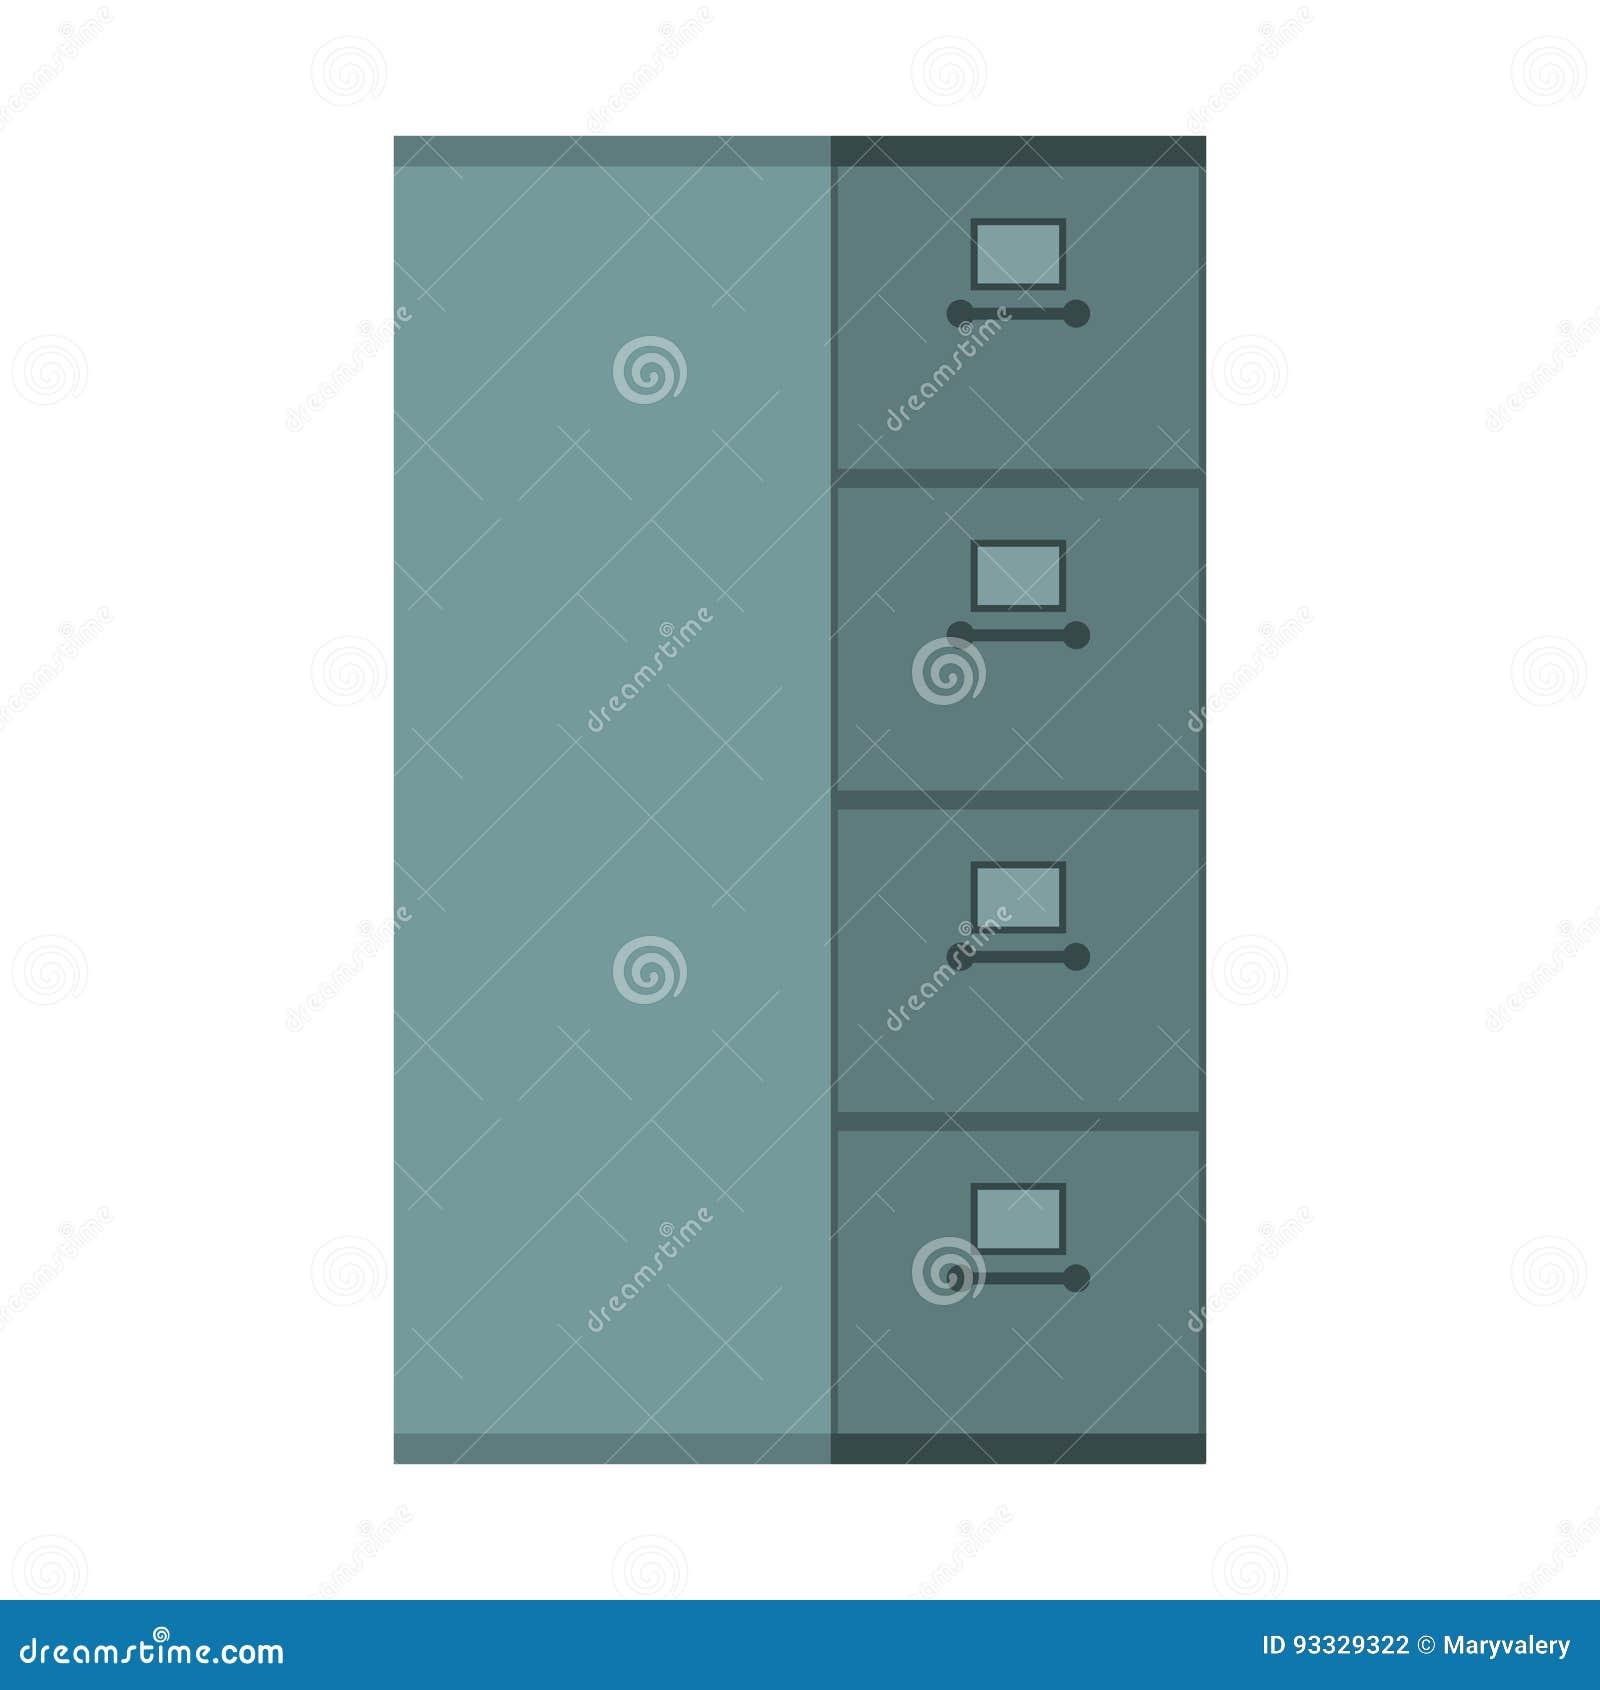 Cab Datei Geschlossen Kartei Eisenkasten Fur Dokumente Buro Vektor